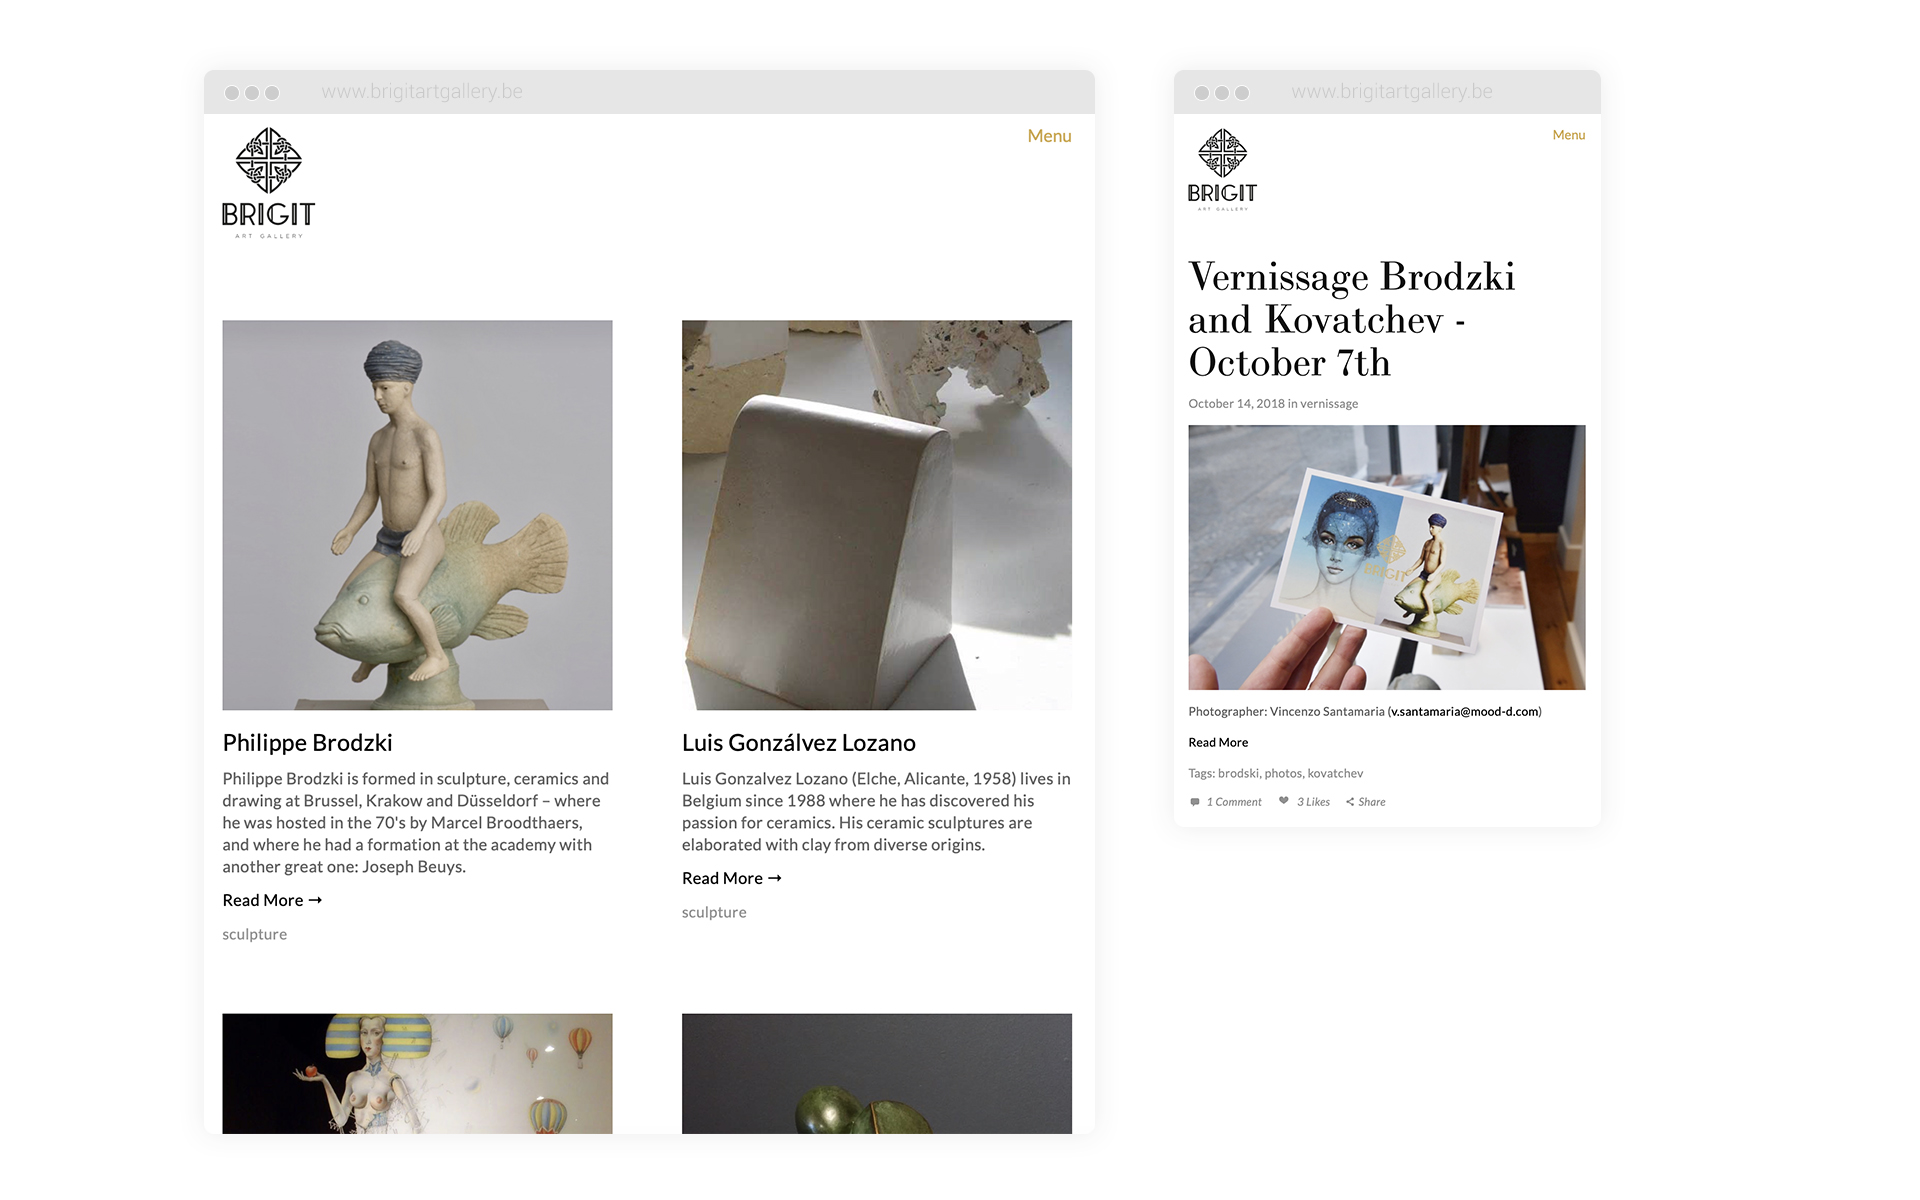 brigit website responsive design.jpg